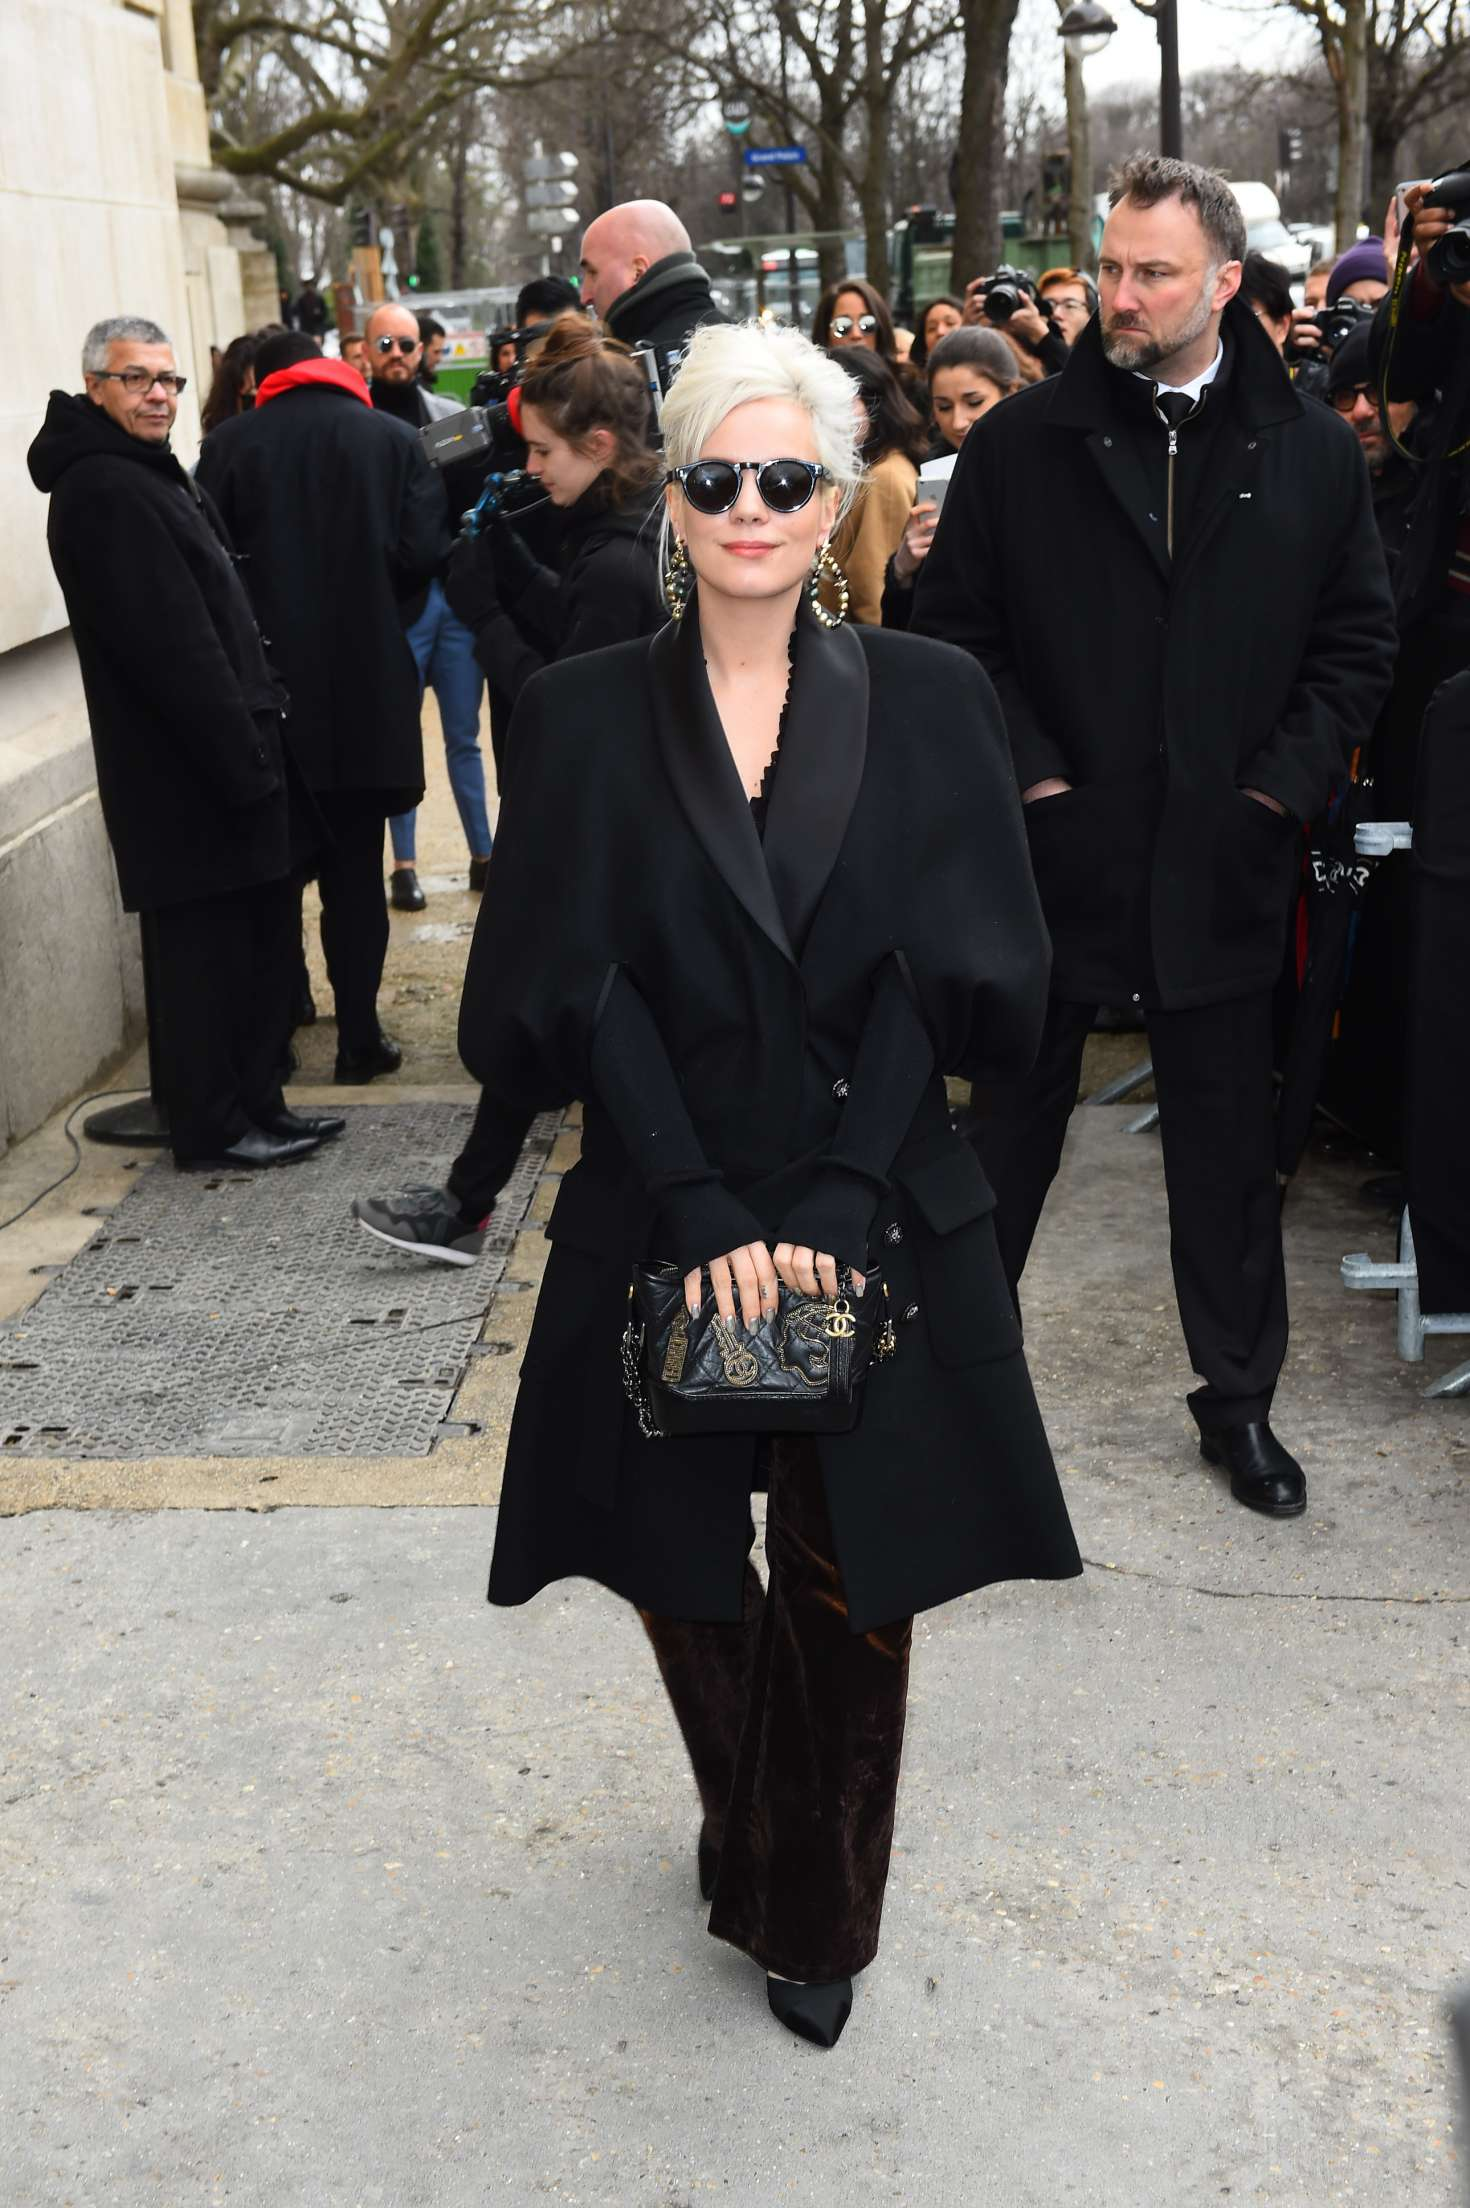 Lily Allen 2017 : Lily Allen at Chanel Show 2017 in Paris -09